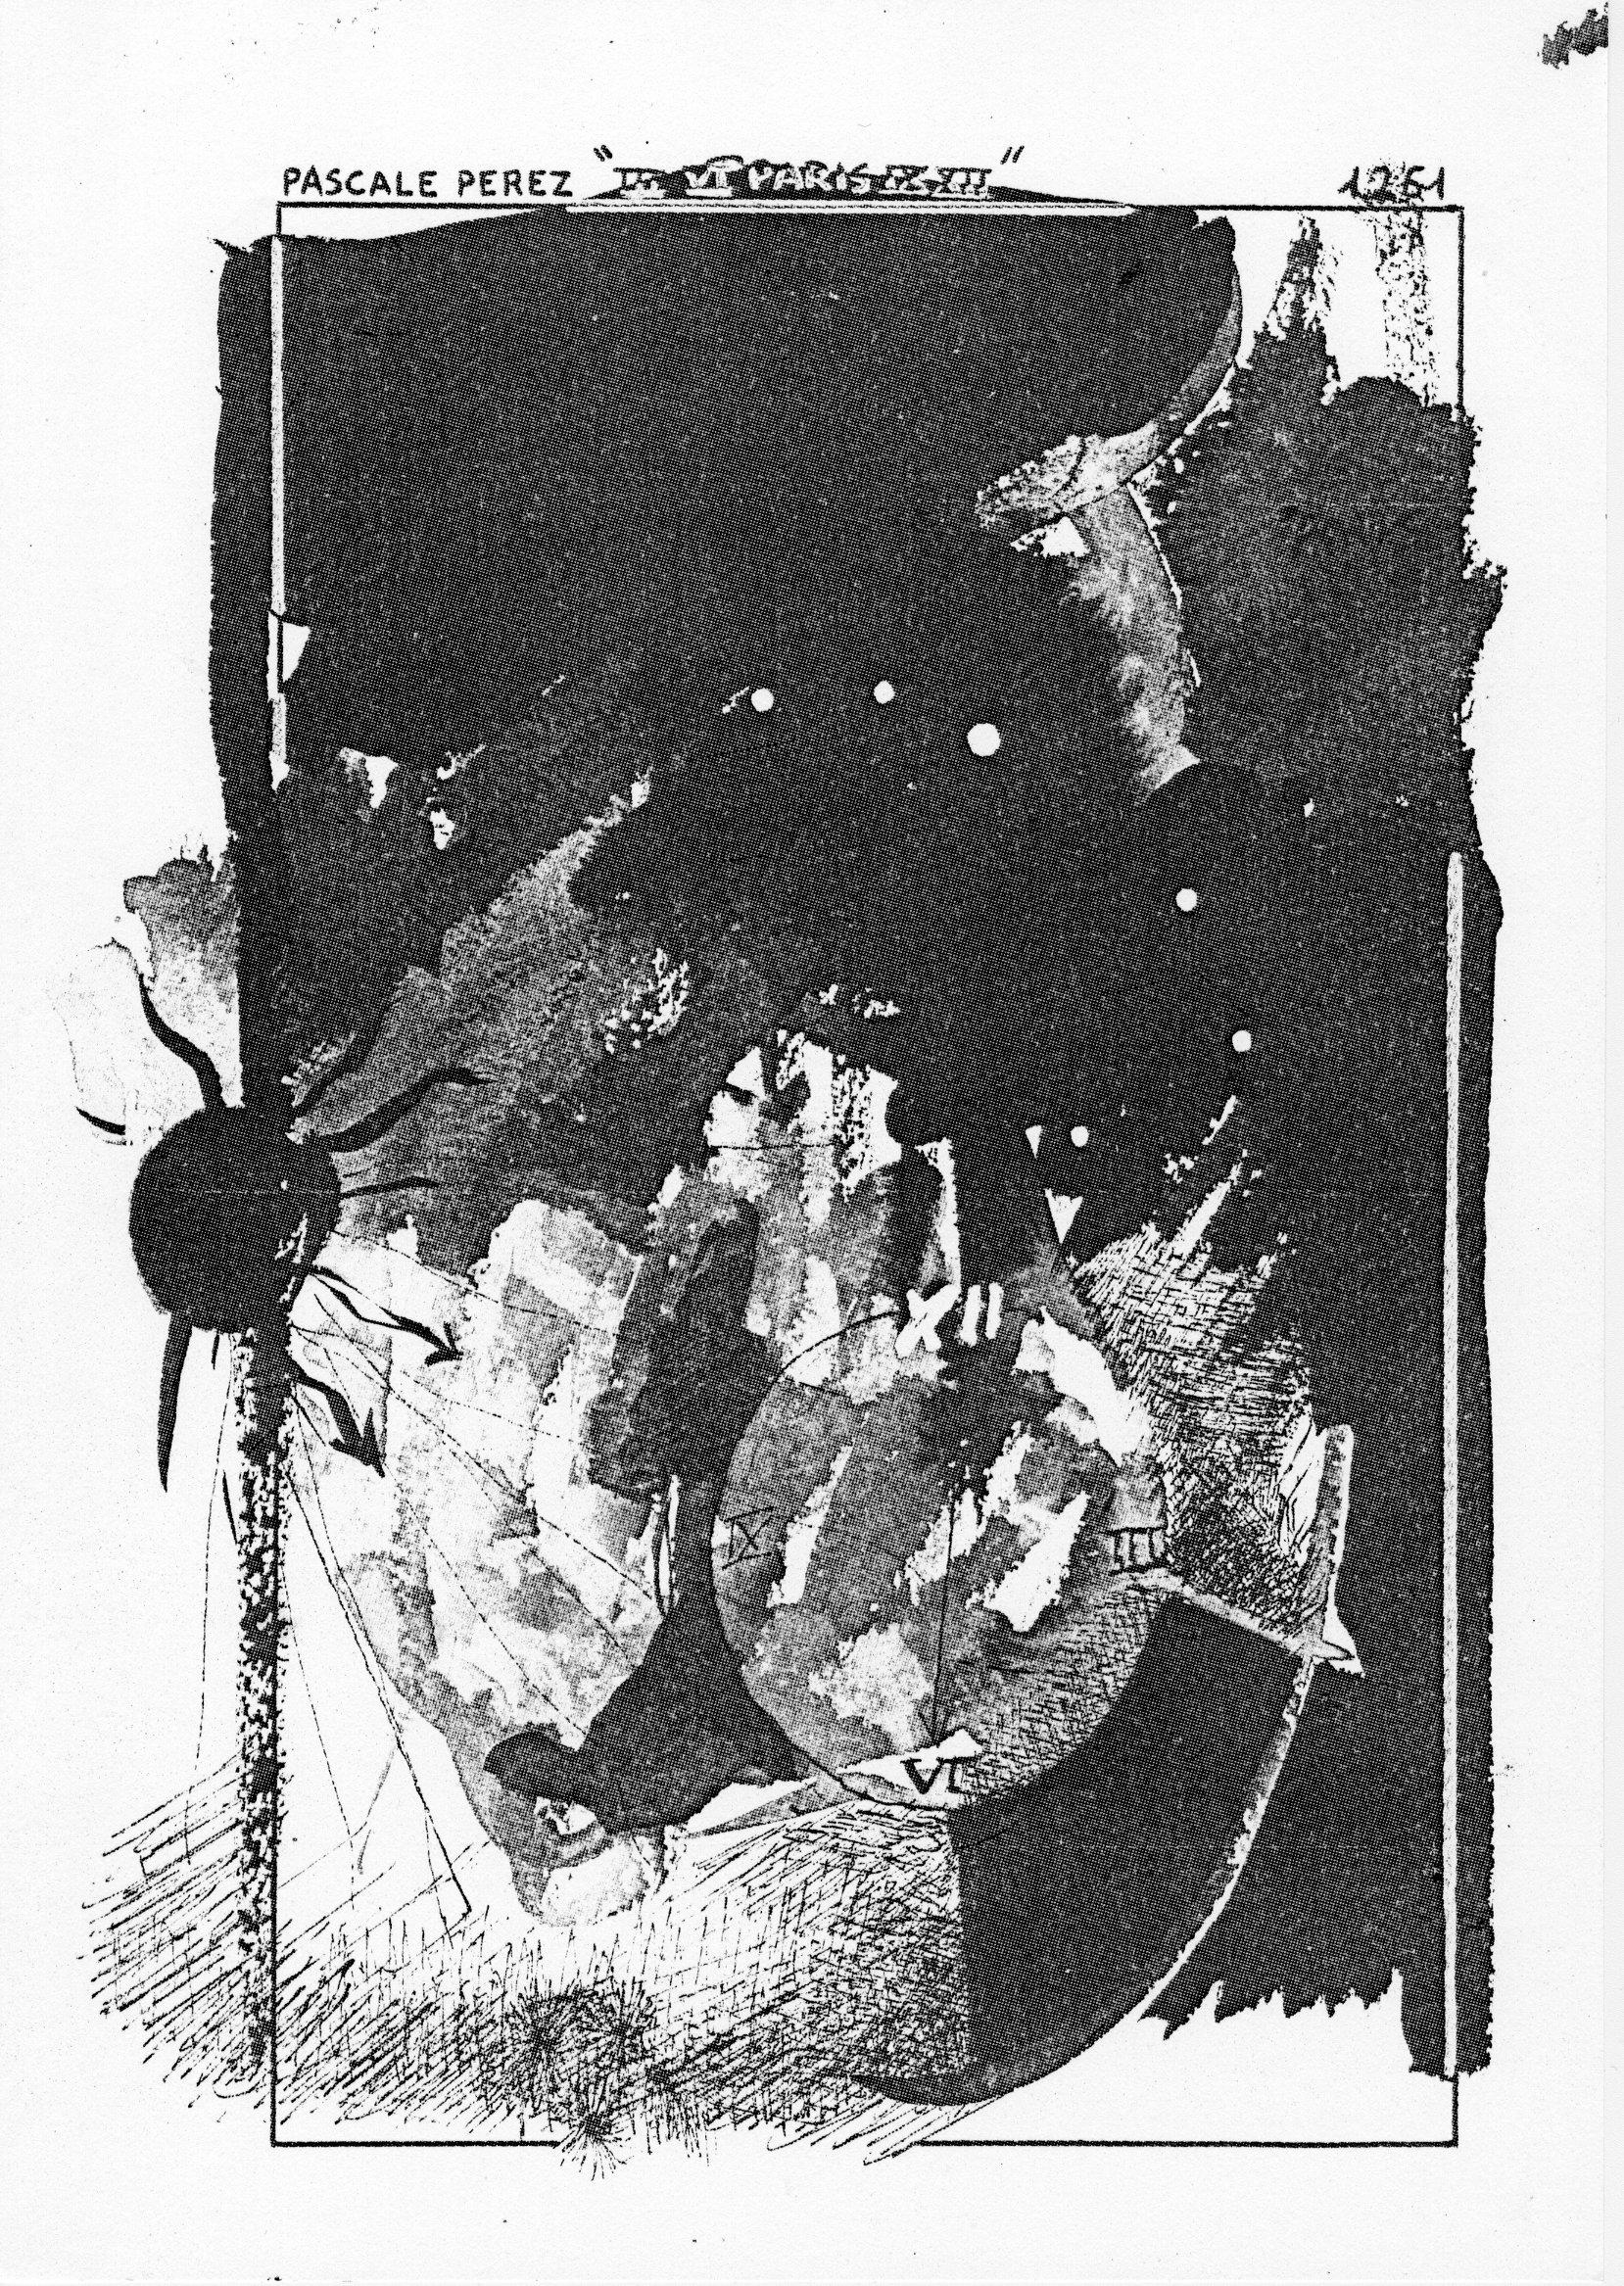 page 1261 P. PEREZ III VI PARIS IX XII